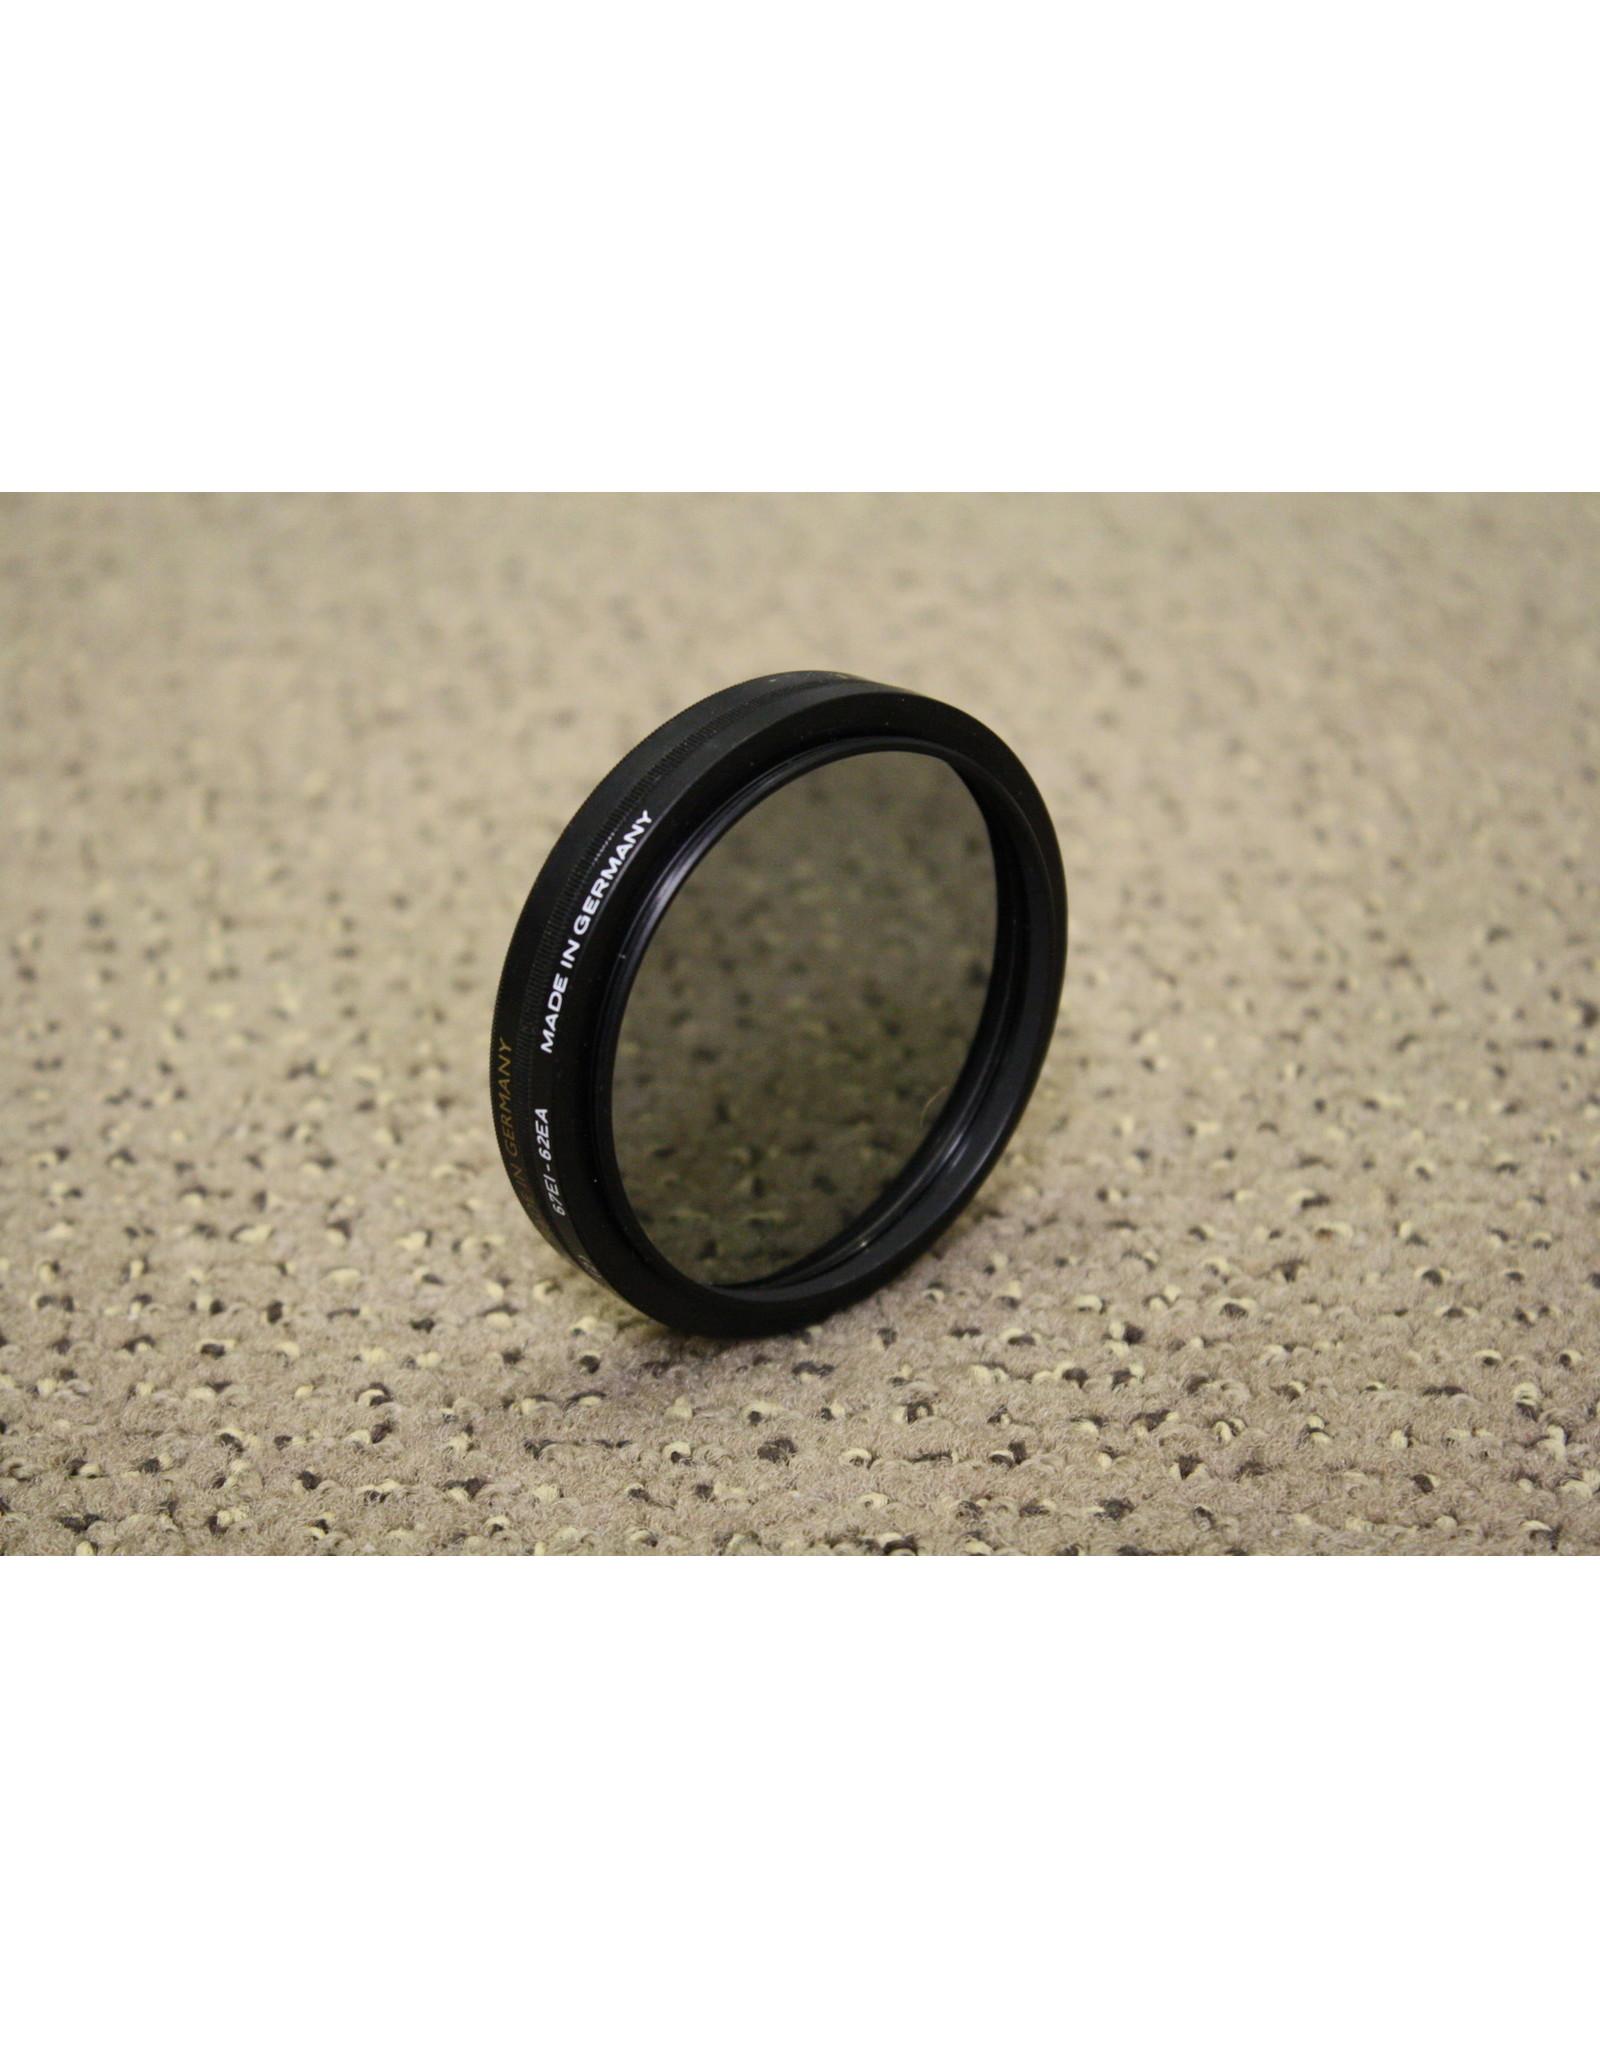 B + W 67mm XS-Pro Kaesemann HT Circular Polarizer Filter, MRC Nano Coating (Pre-owned)